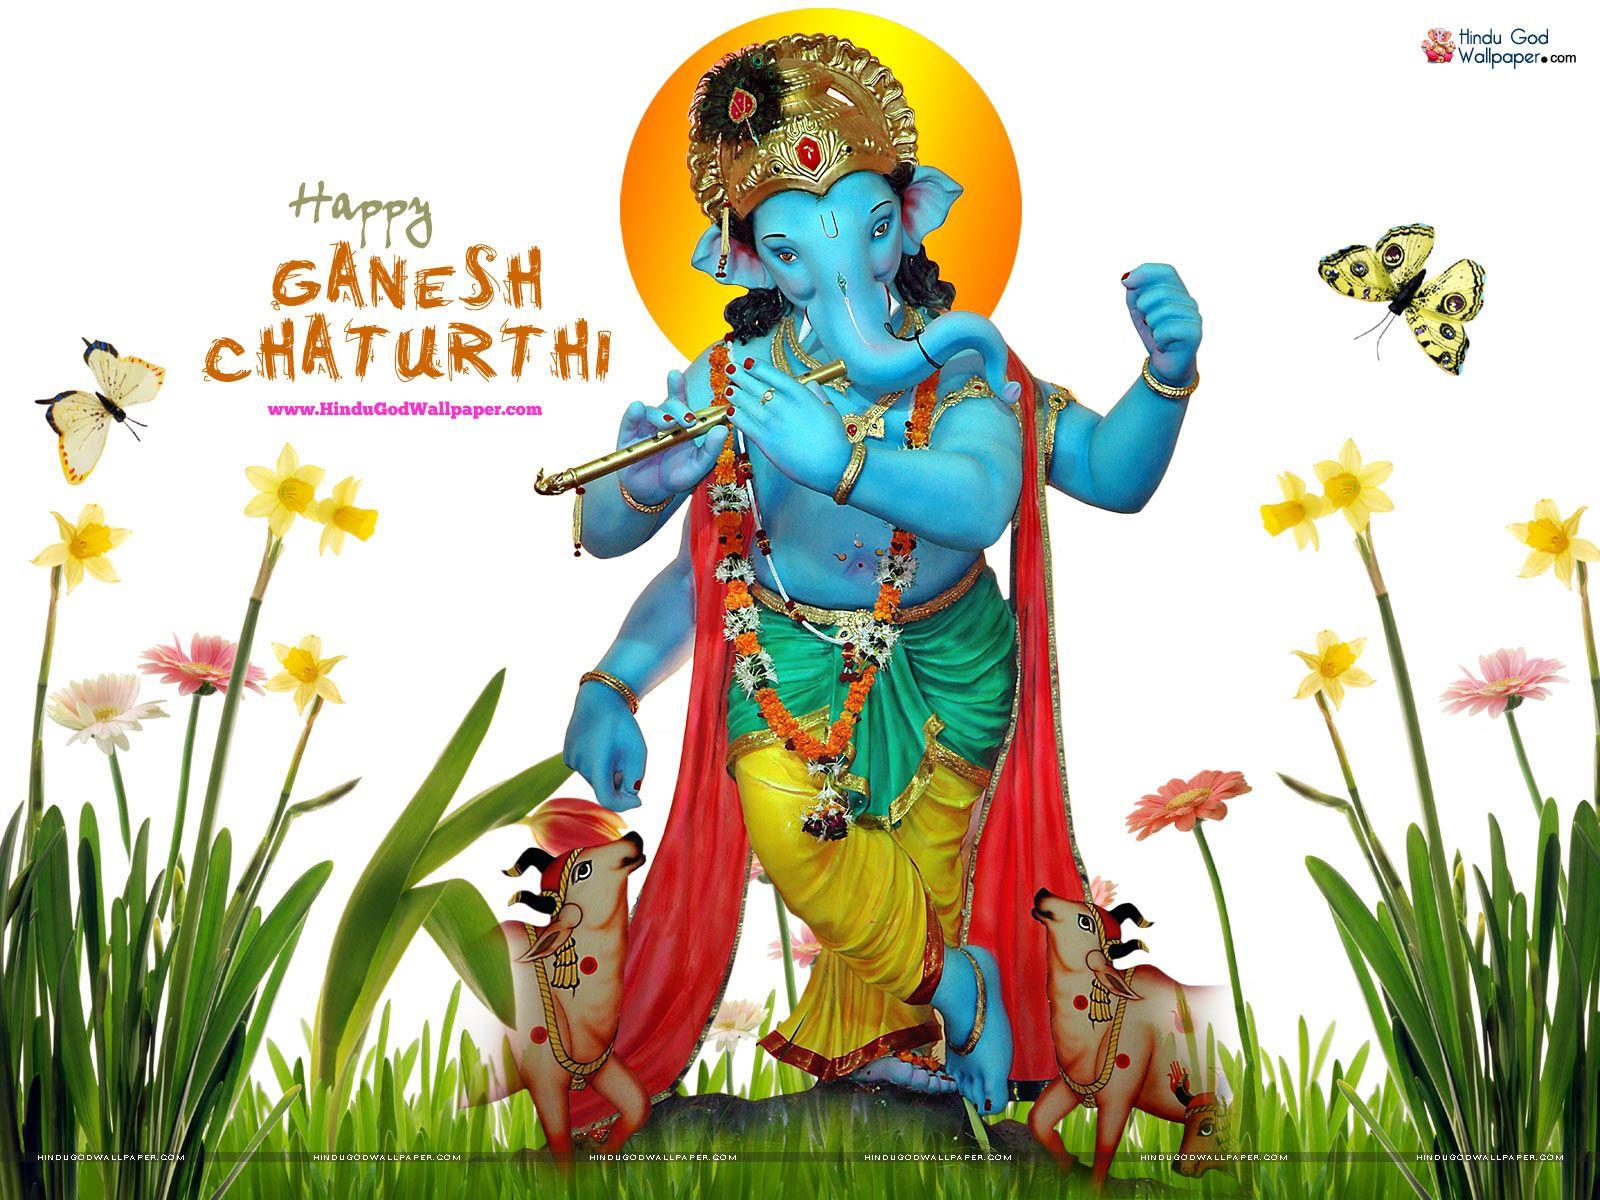 Pen Ganesh Murtidownload Hd: Ganesh Chaturthi Live HD Wallpapers Free Download